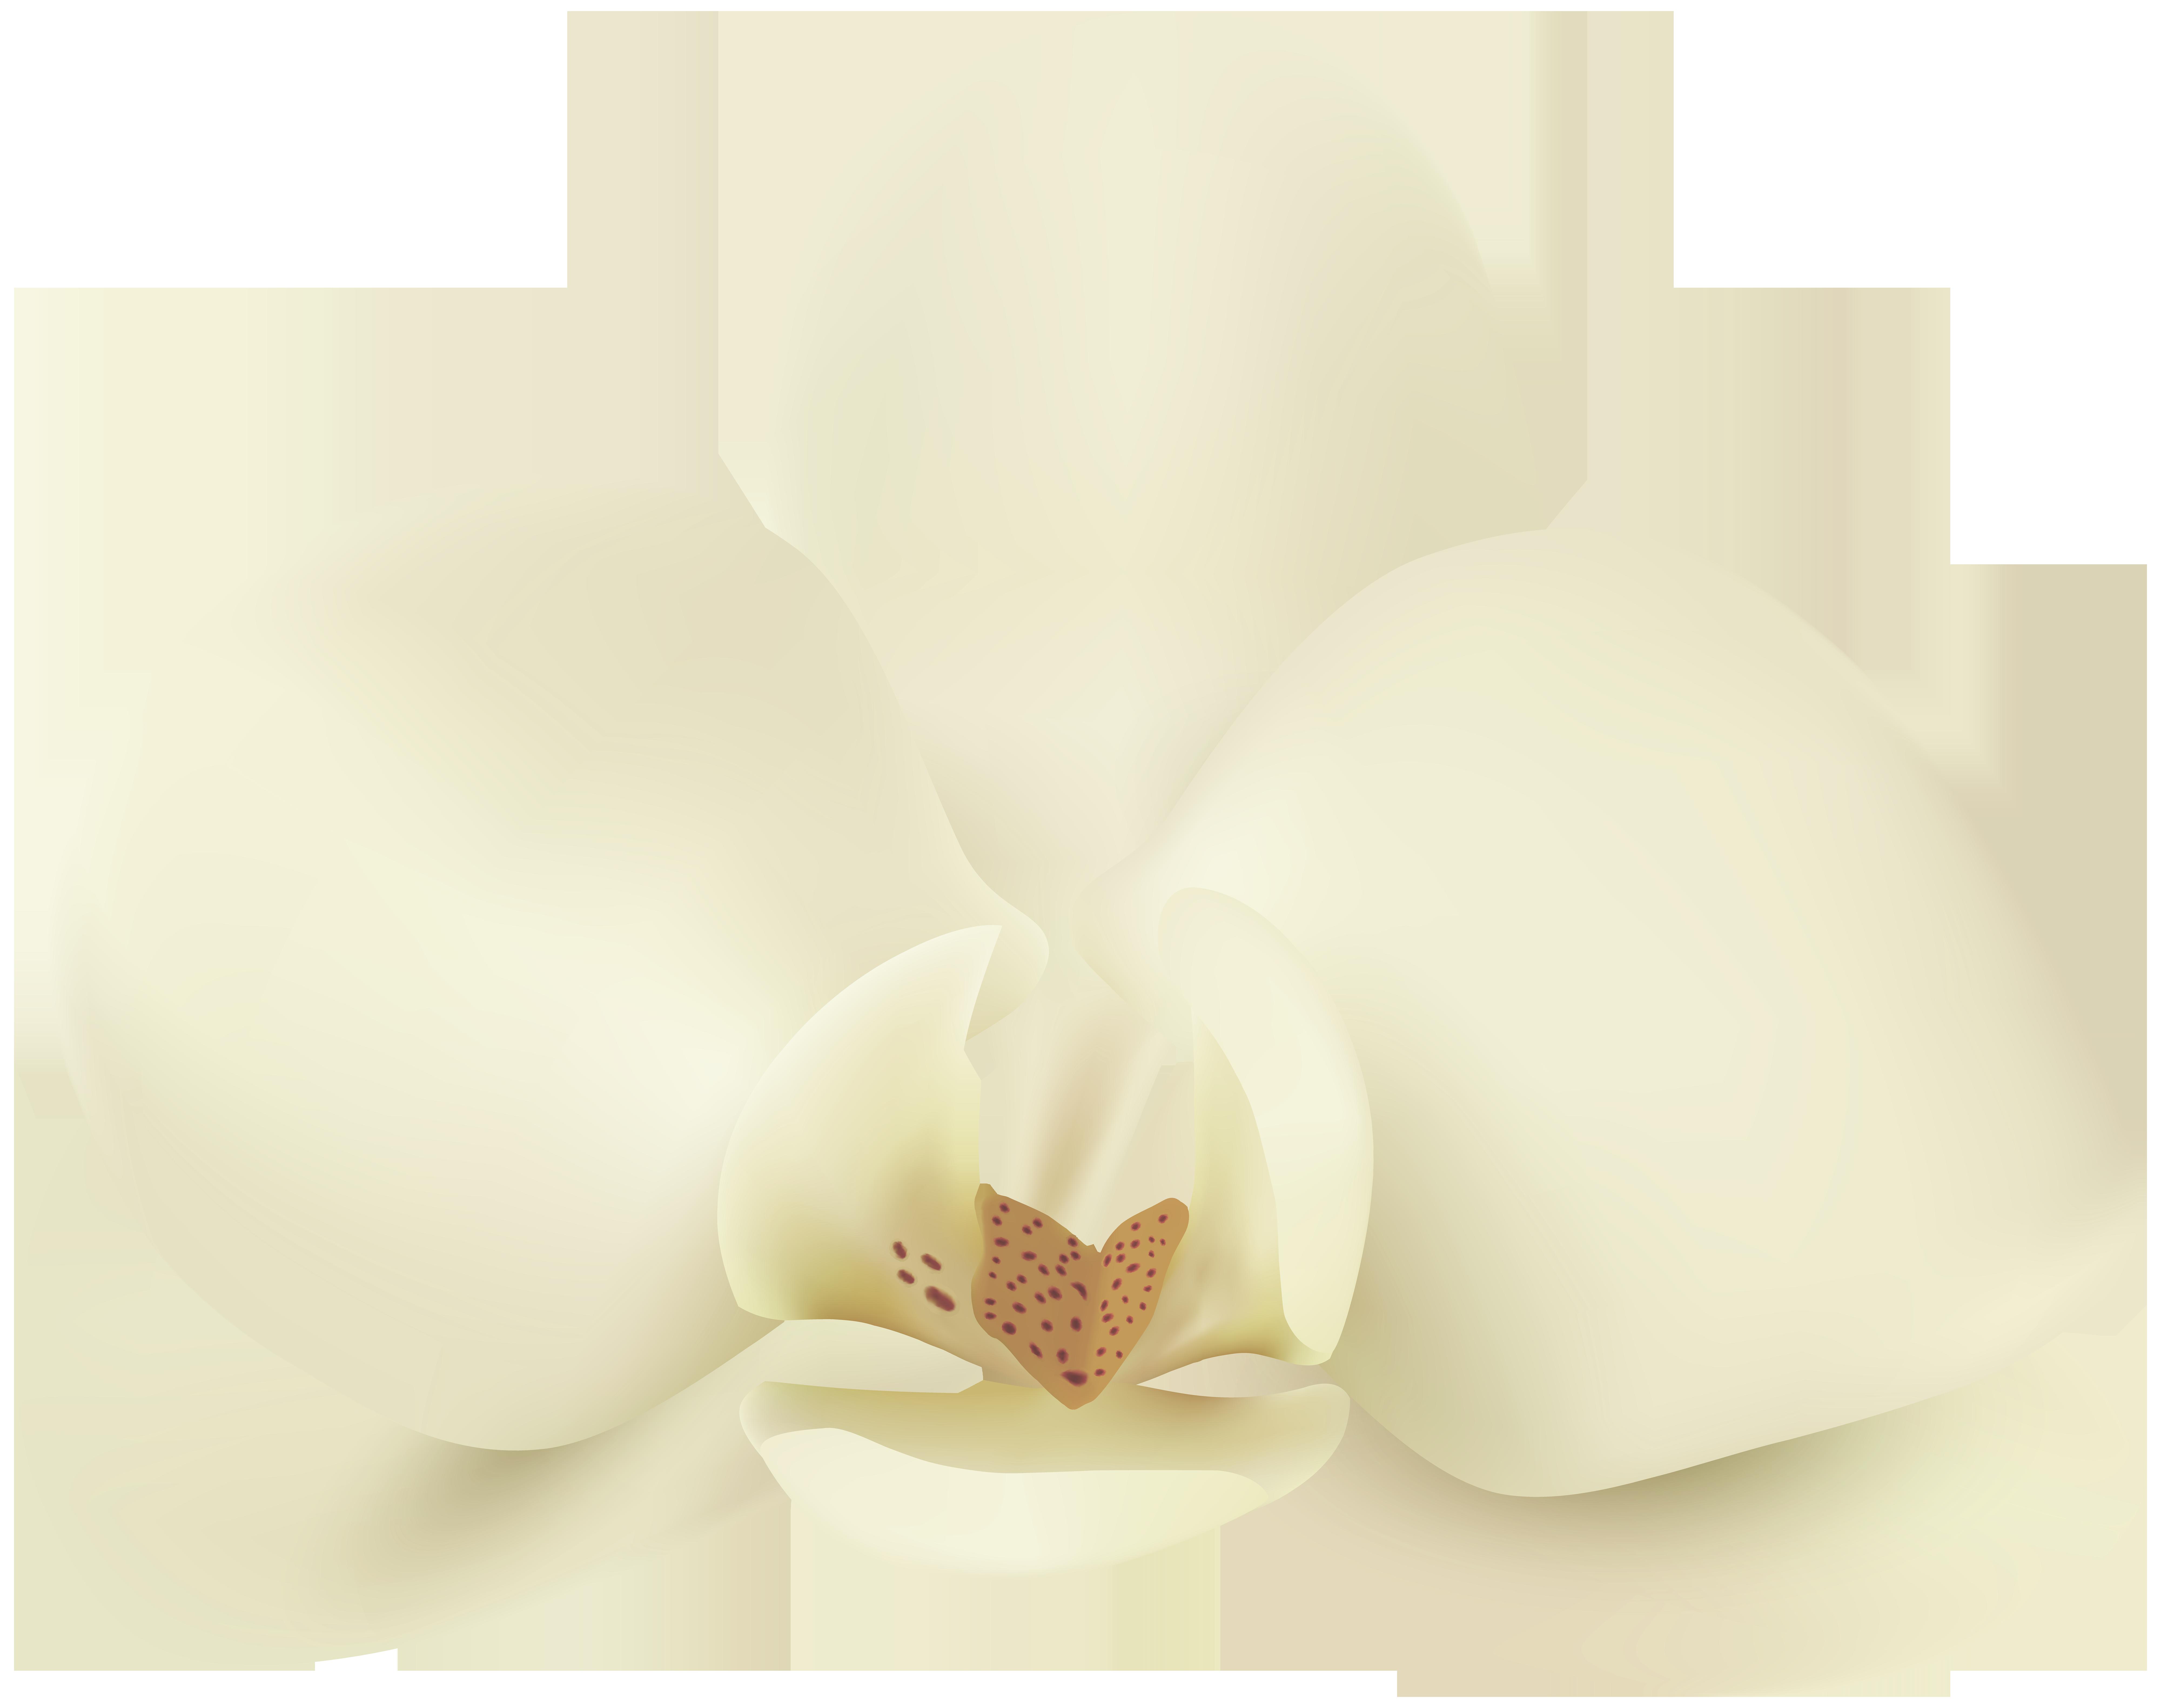 Vanilla flower clipart image black and white library Vanilla Flower PNG Clip Art Image | Gallery Yopriceville - High ... image black and white library